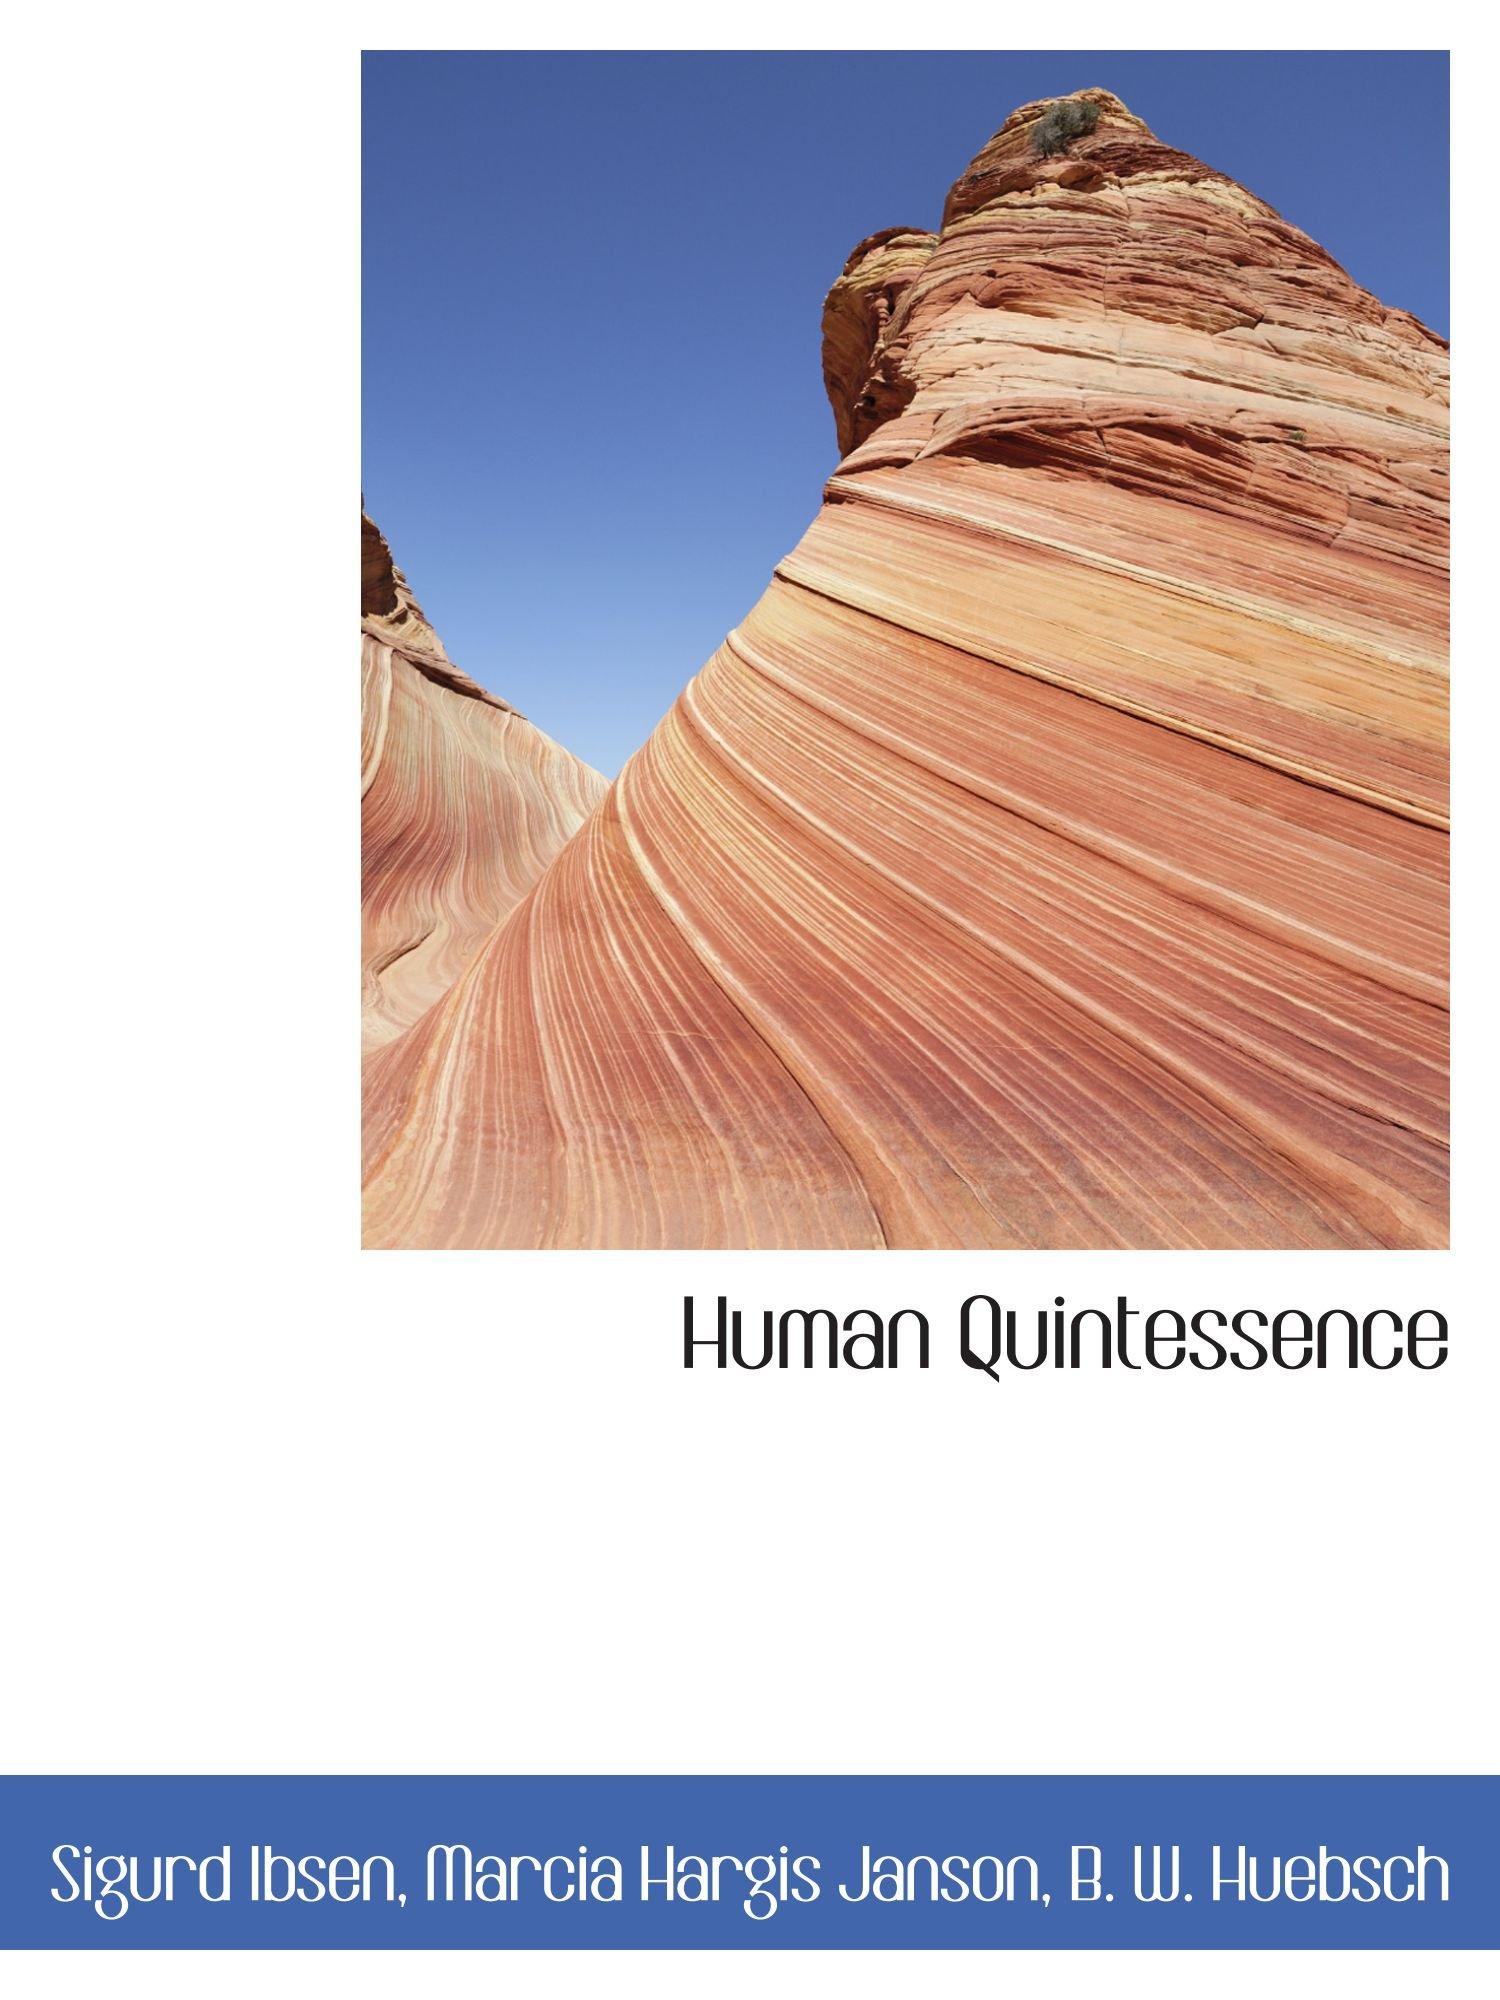 Human Quintessence: Sigurd Ibsen, Marcia Hargis Janson, B. W. Huebsch:  9781140264514: Books - Amazon.ca